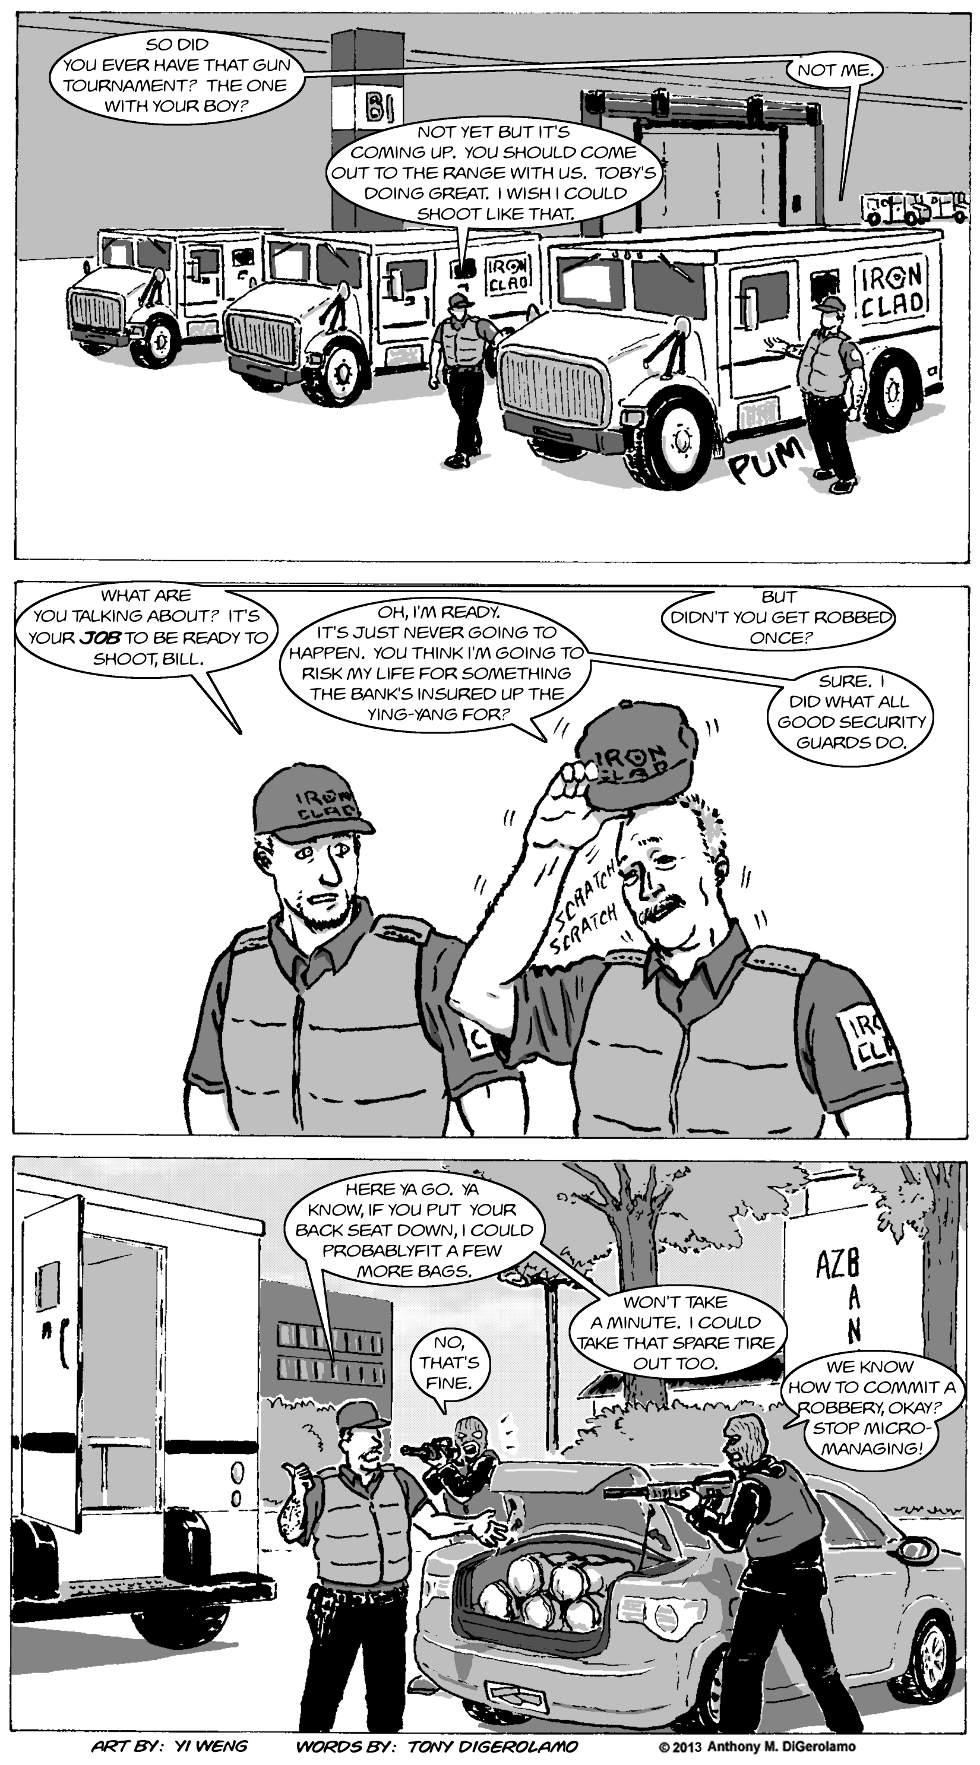 Gun Culture:  A Good Security Guard